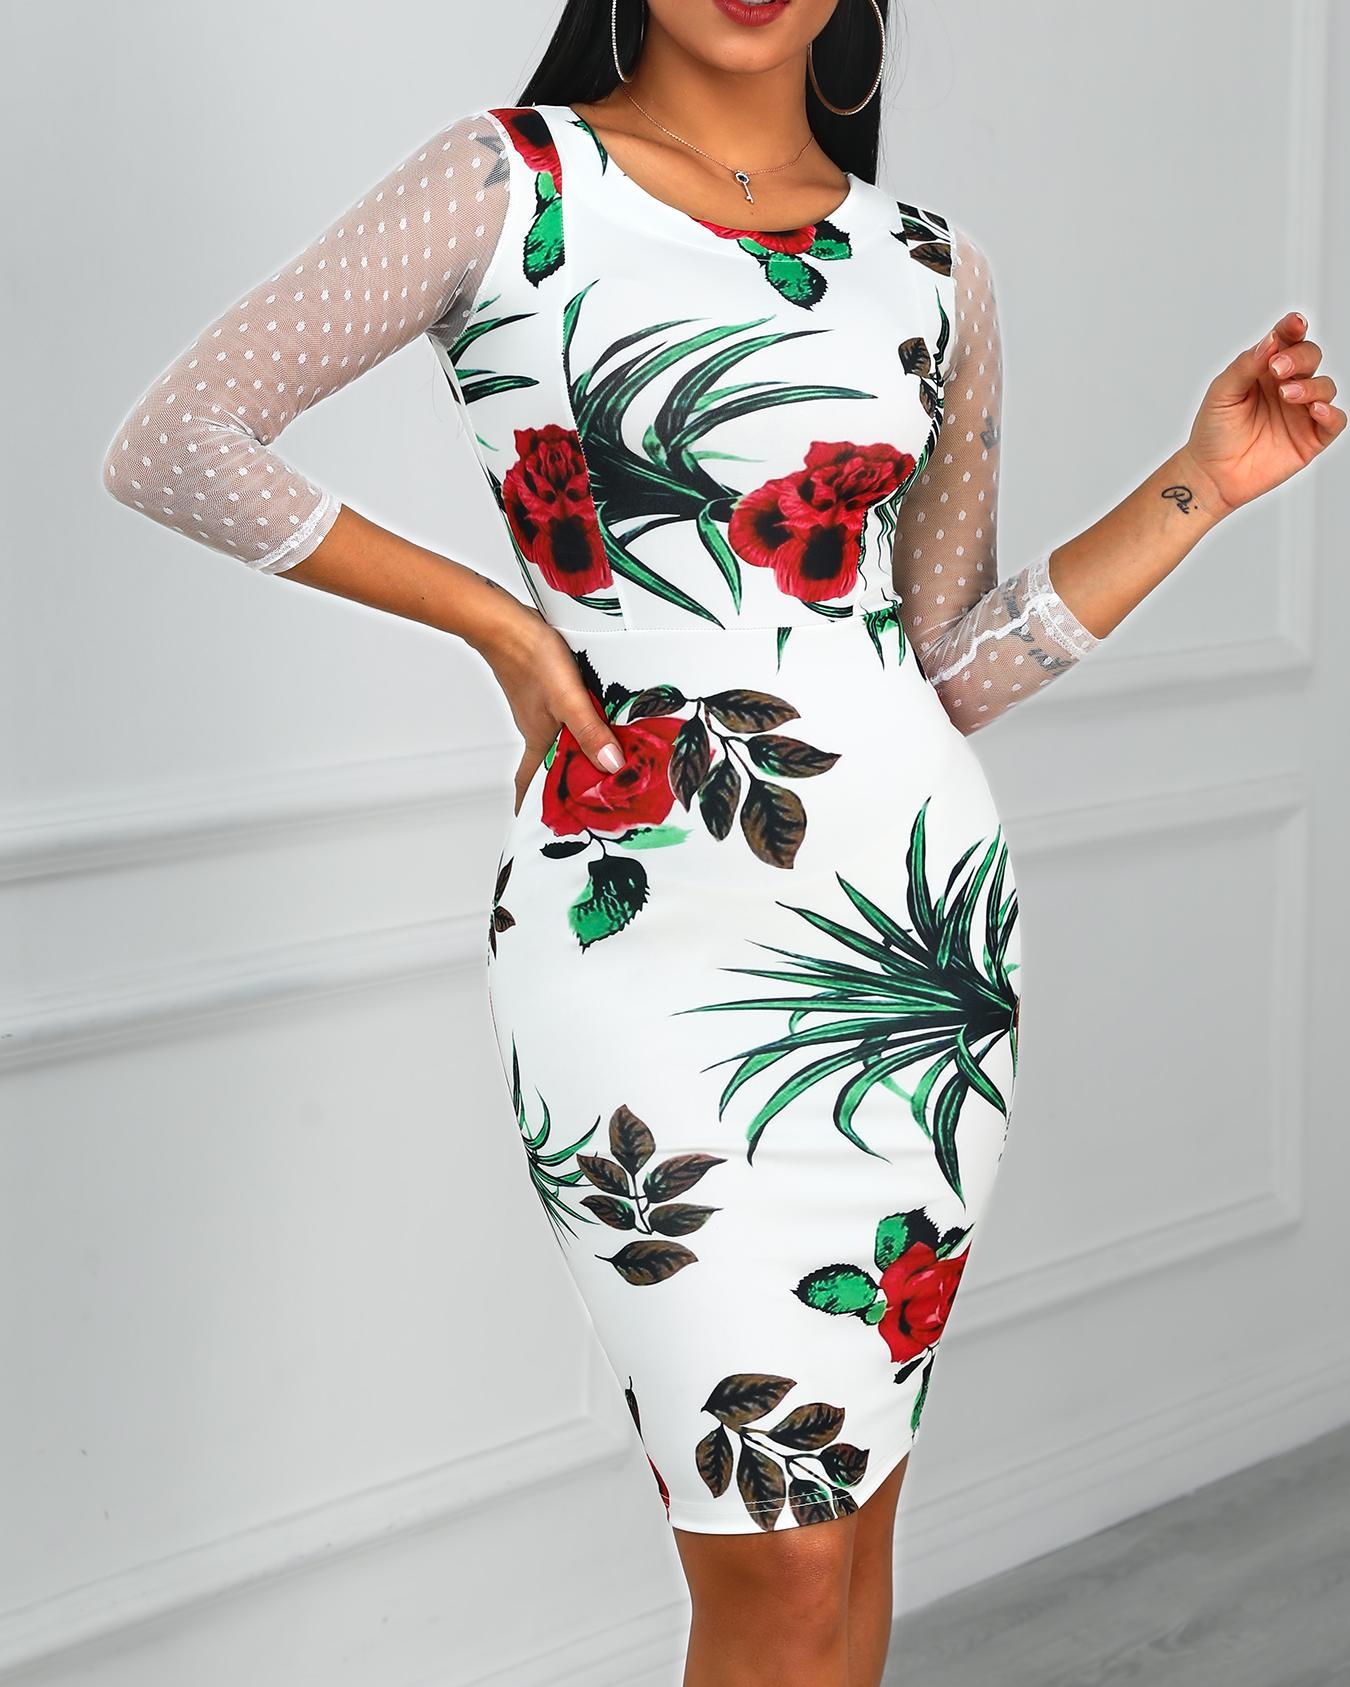 Floral Print Mesh Insert Dress